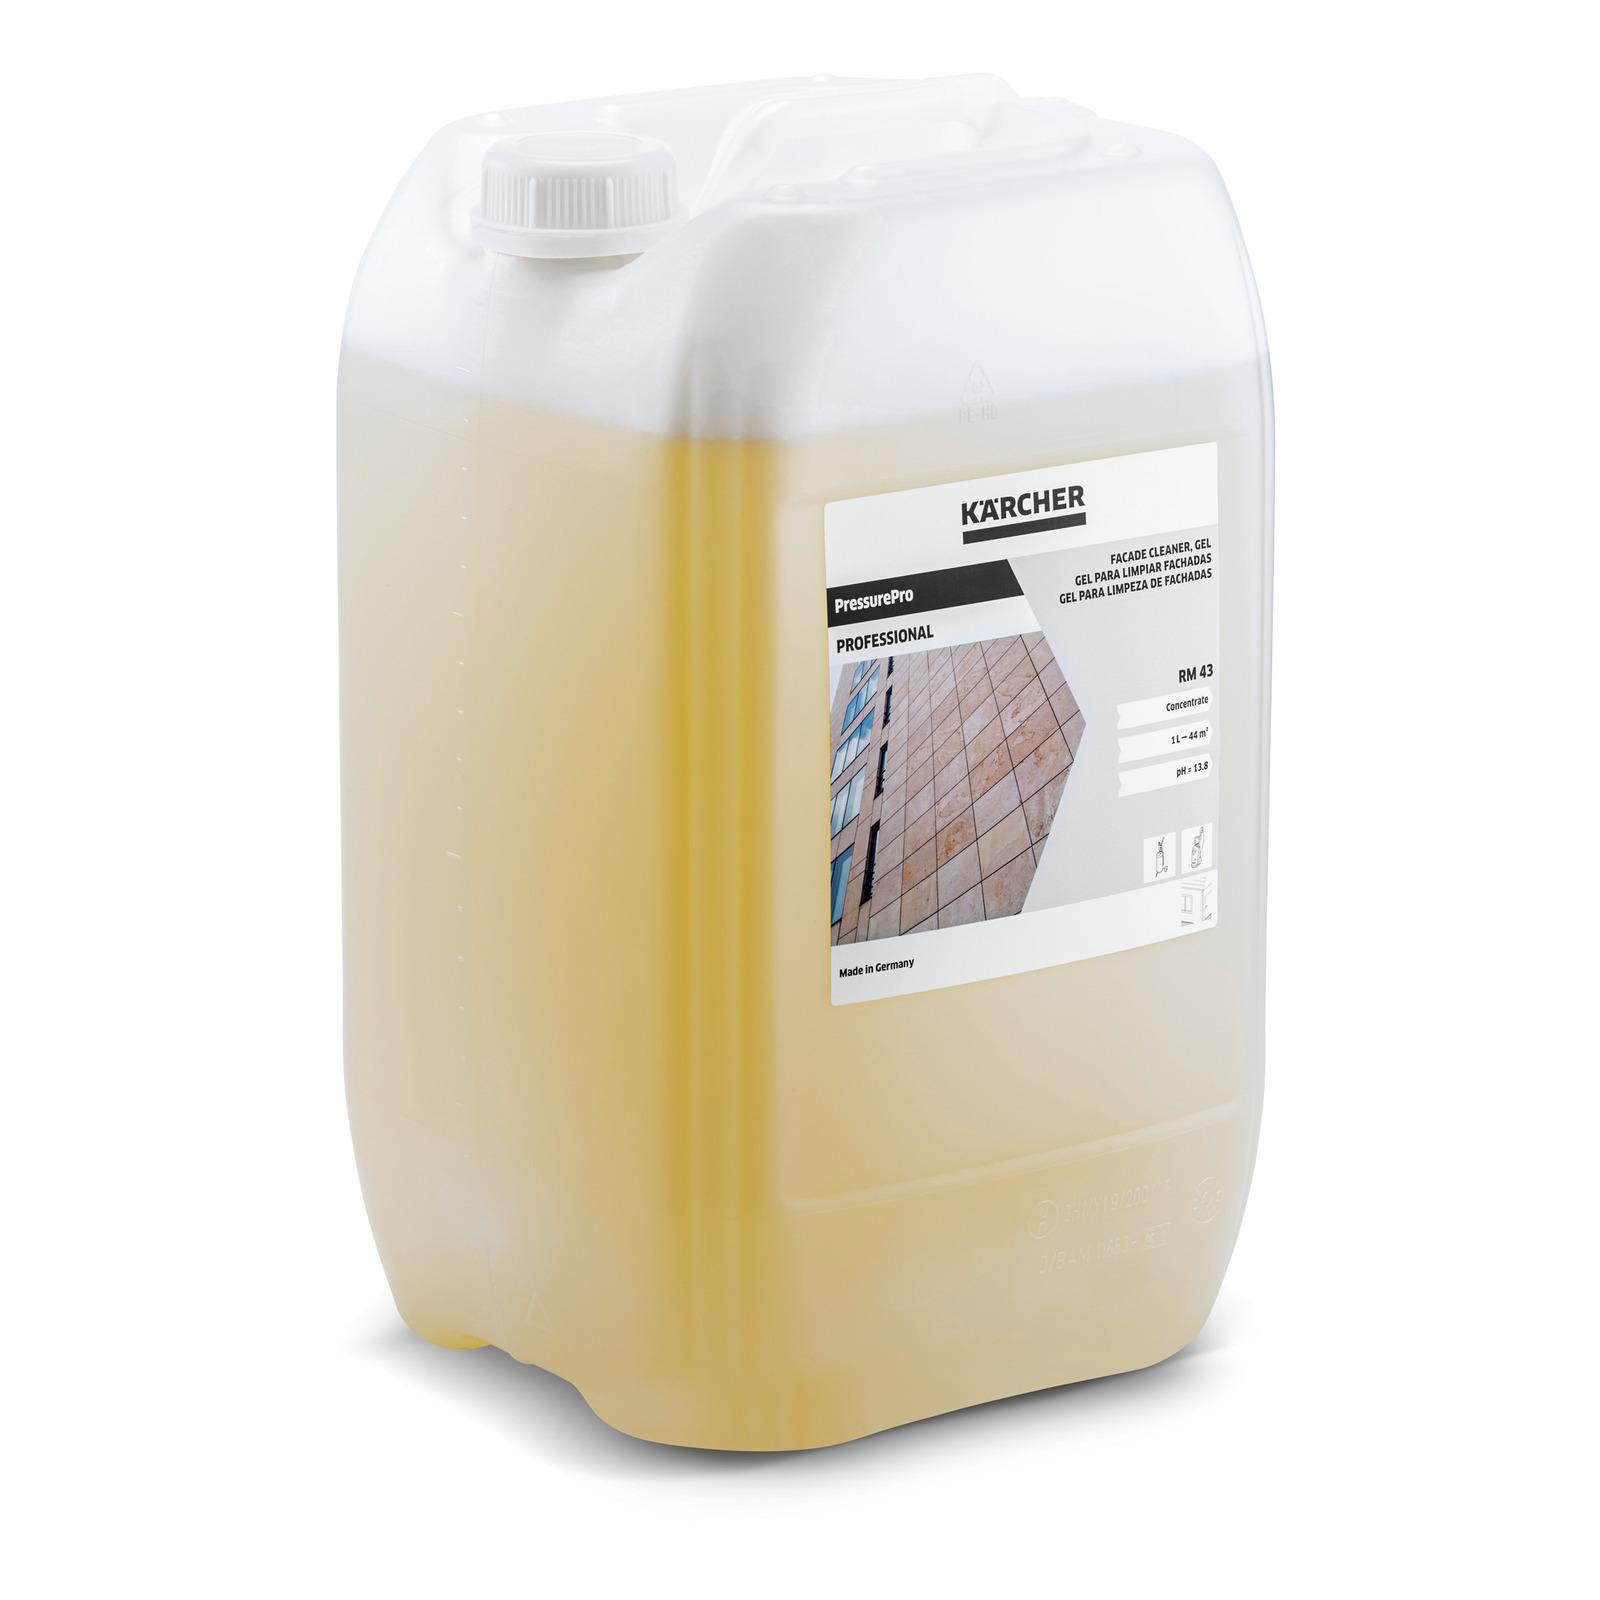 D tergent pour fa ades pressurepro gel rm 43 20l k rcher for Gel a depolir le verre